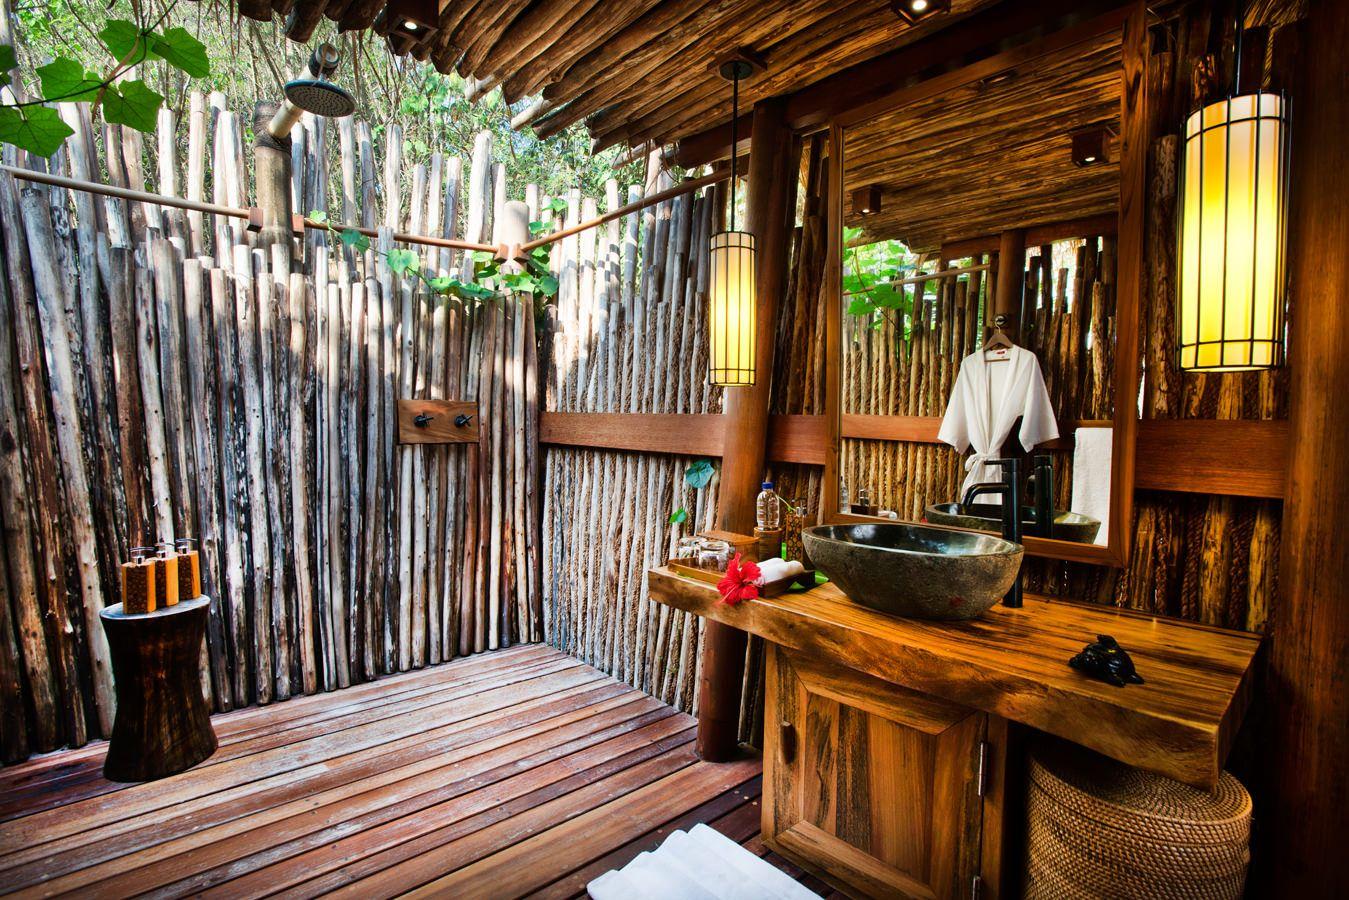 Outdoor Bathroom  Google Search  Alternative Housing Ideas Extraordinary Luxury Outdoor Bathrooms Inspiration Design